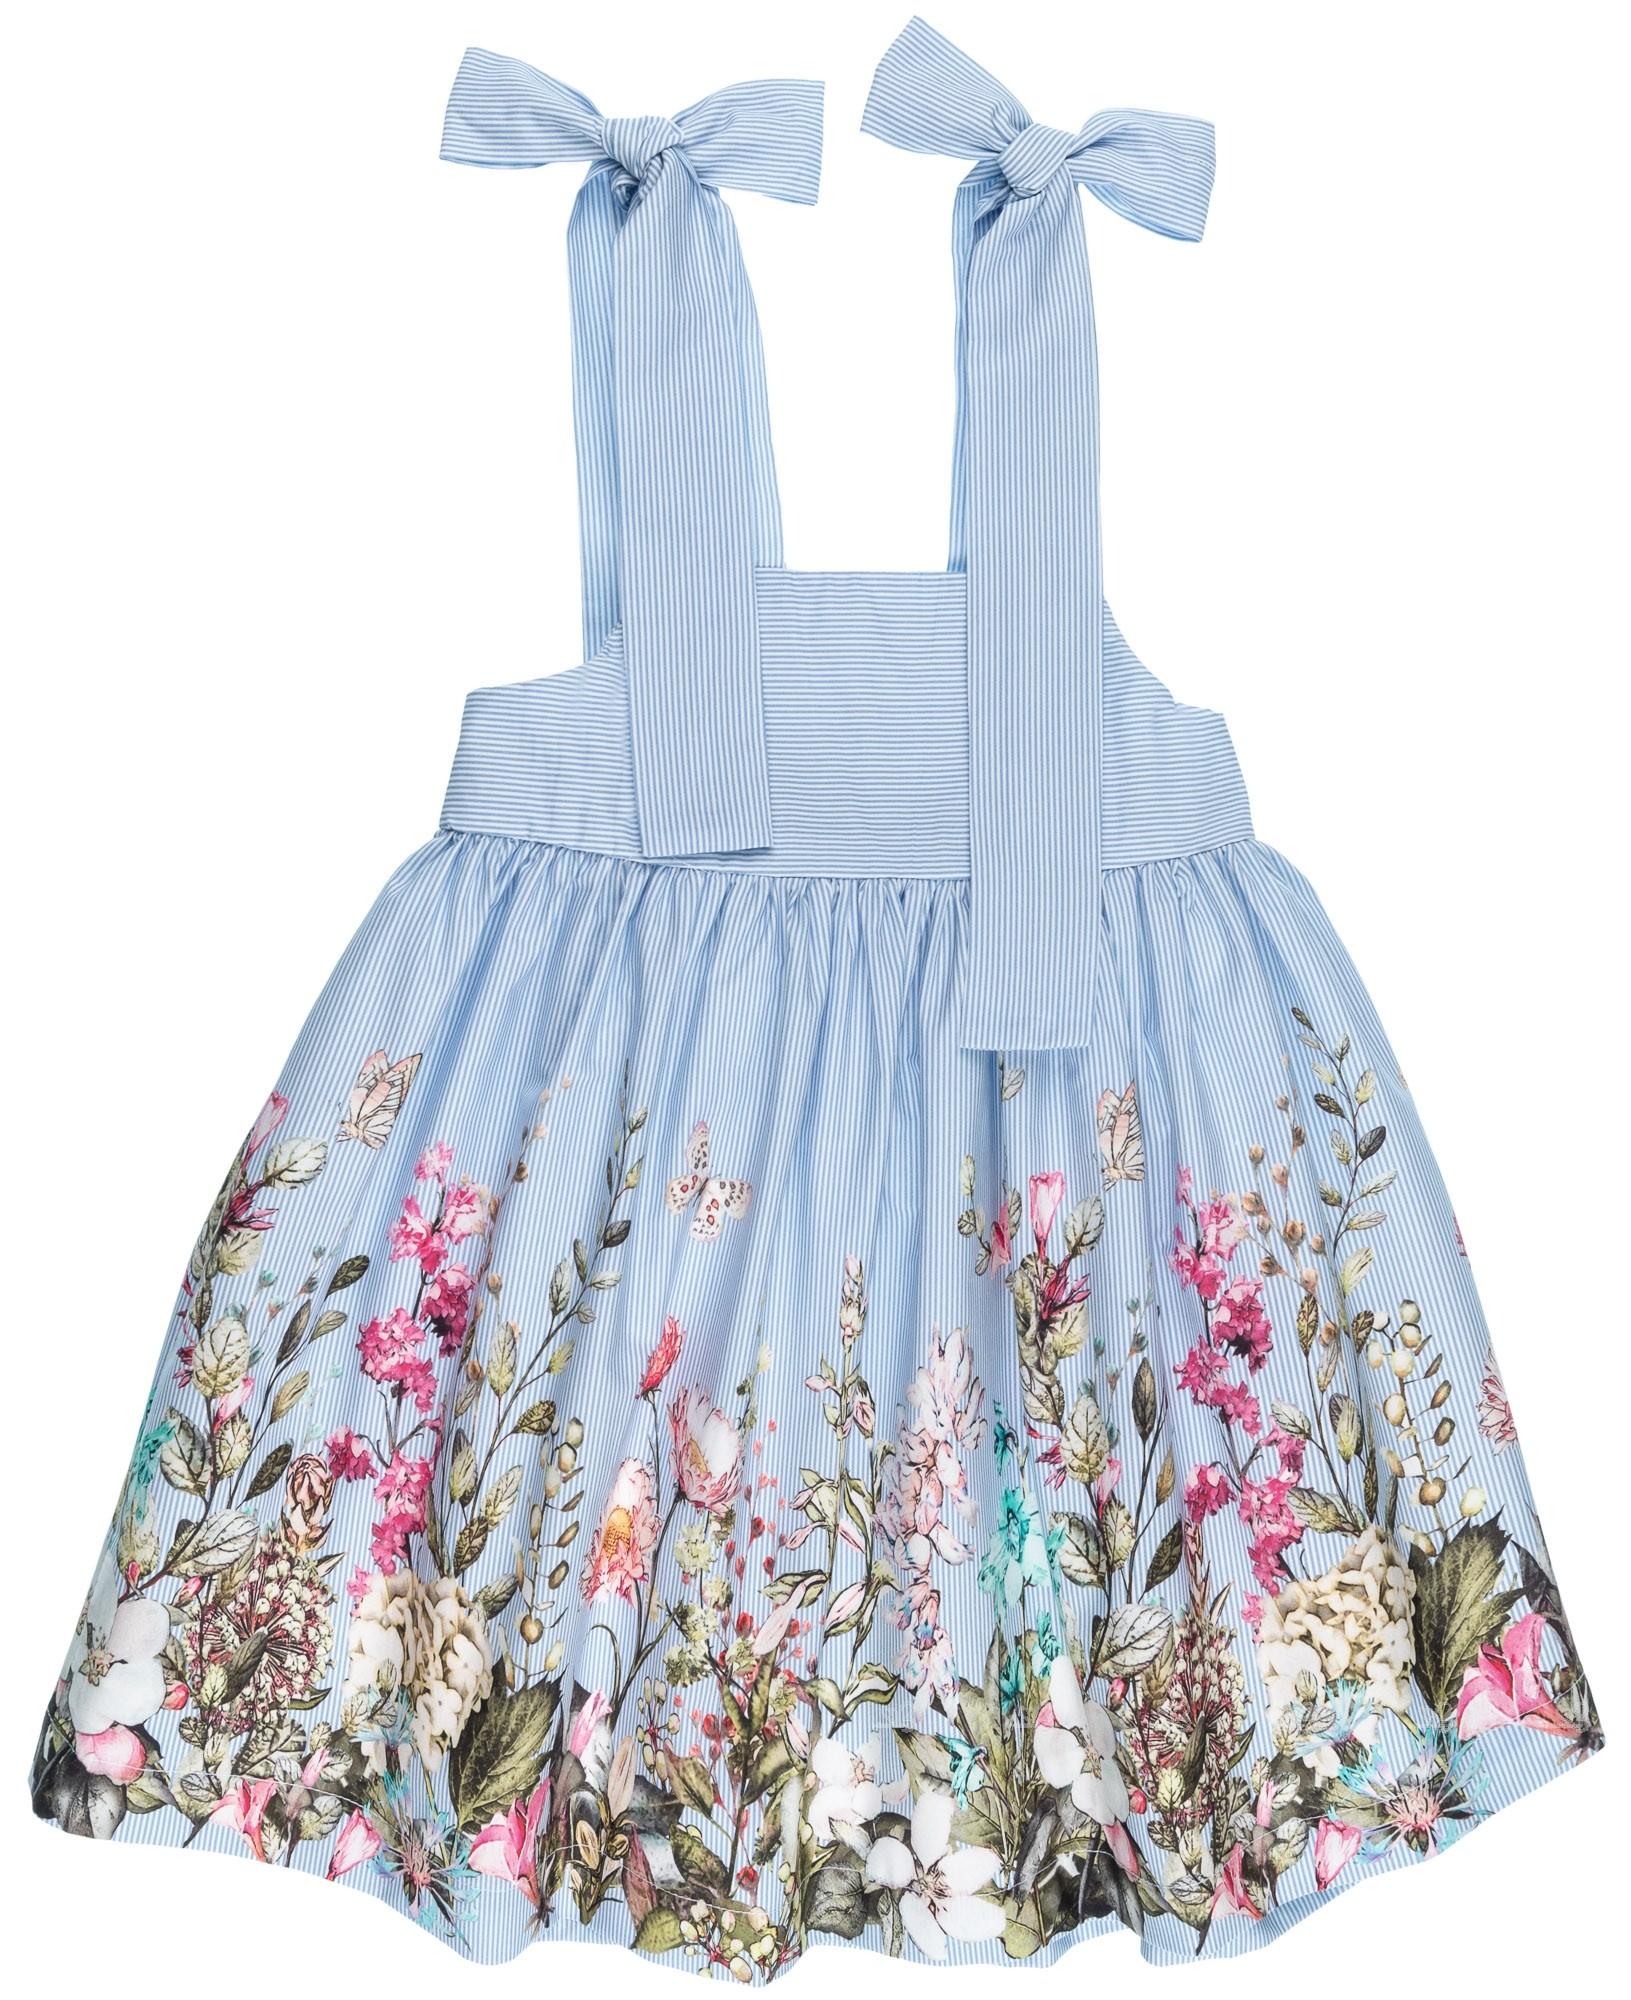 169c17b8d Home; Girls Blue Striped & Floral Print Dress. Vestido Niña Vuelo Rayas &  Estampado Floral Azul ...